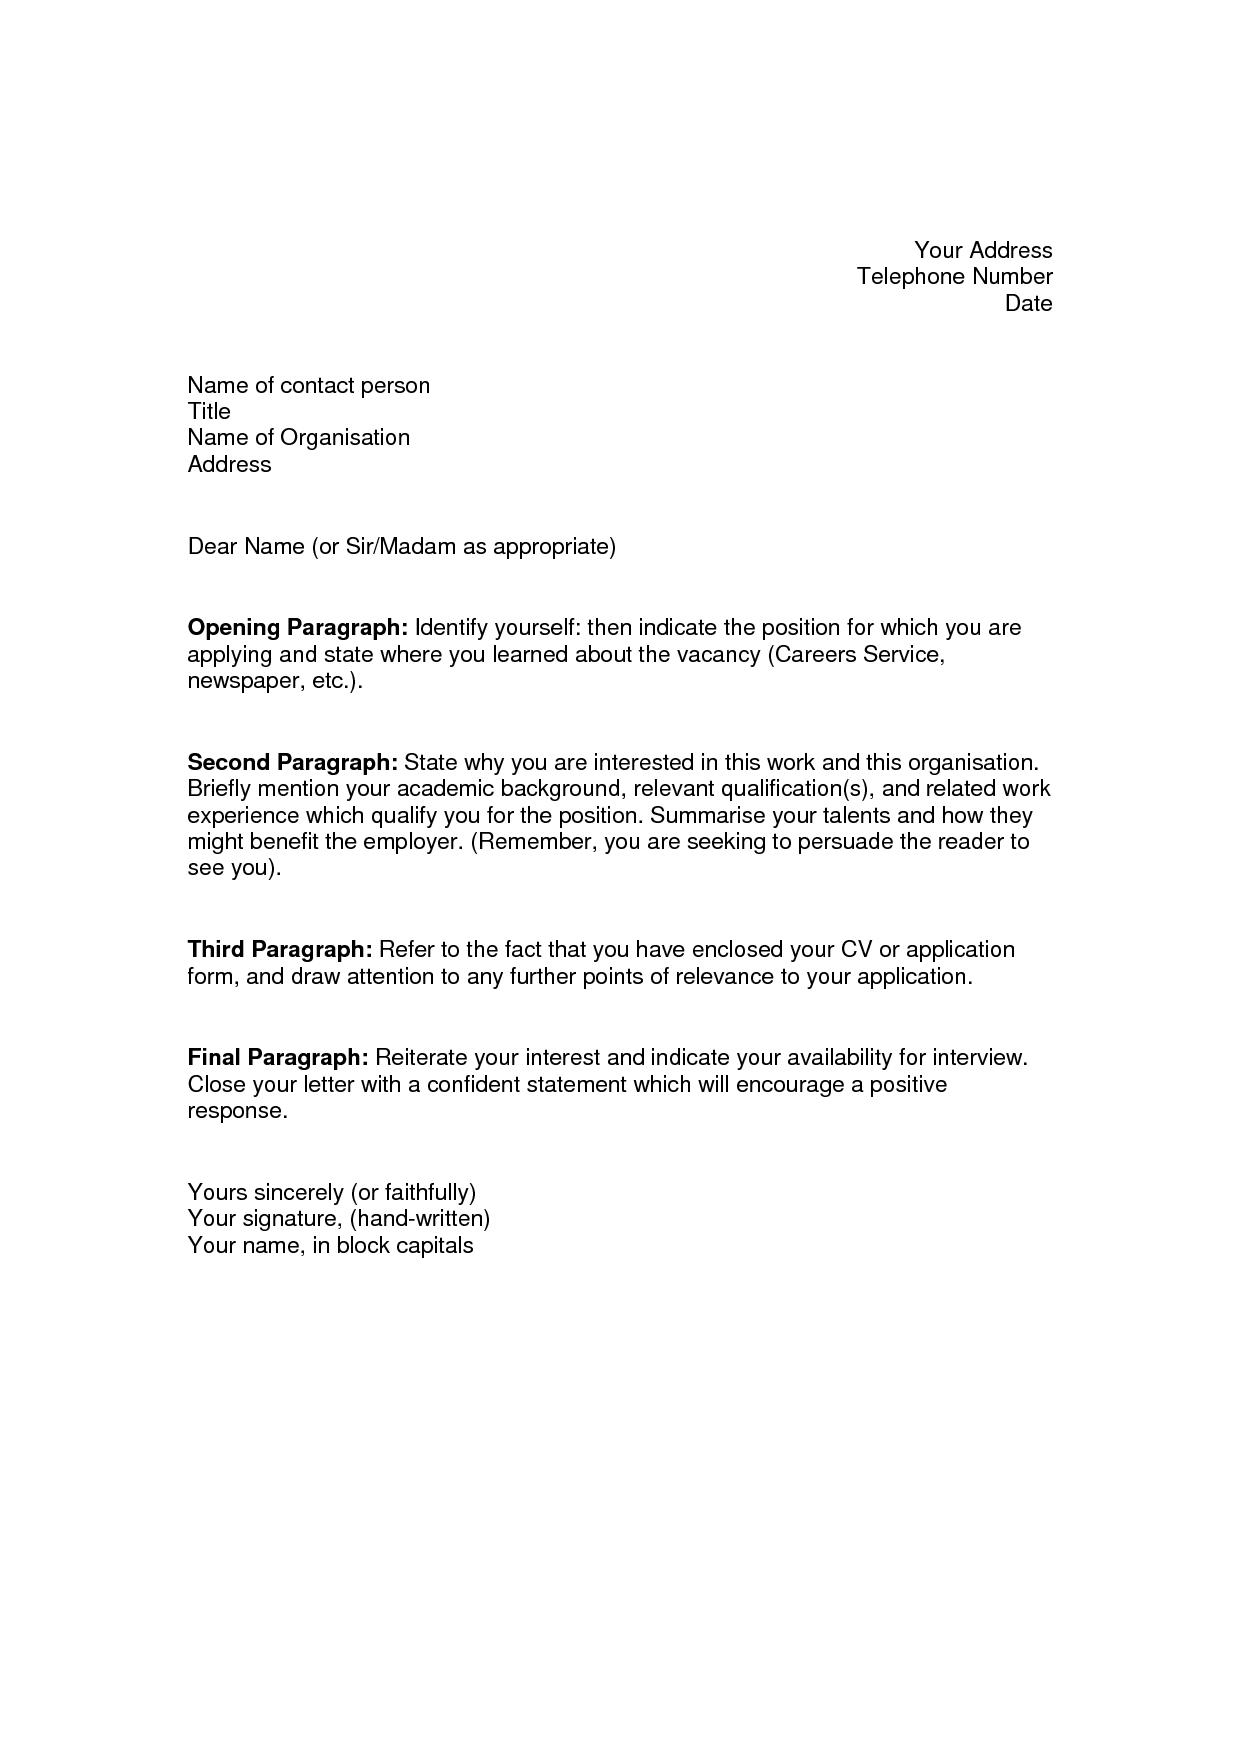 academic job application cover letter